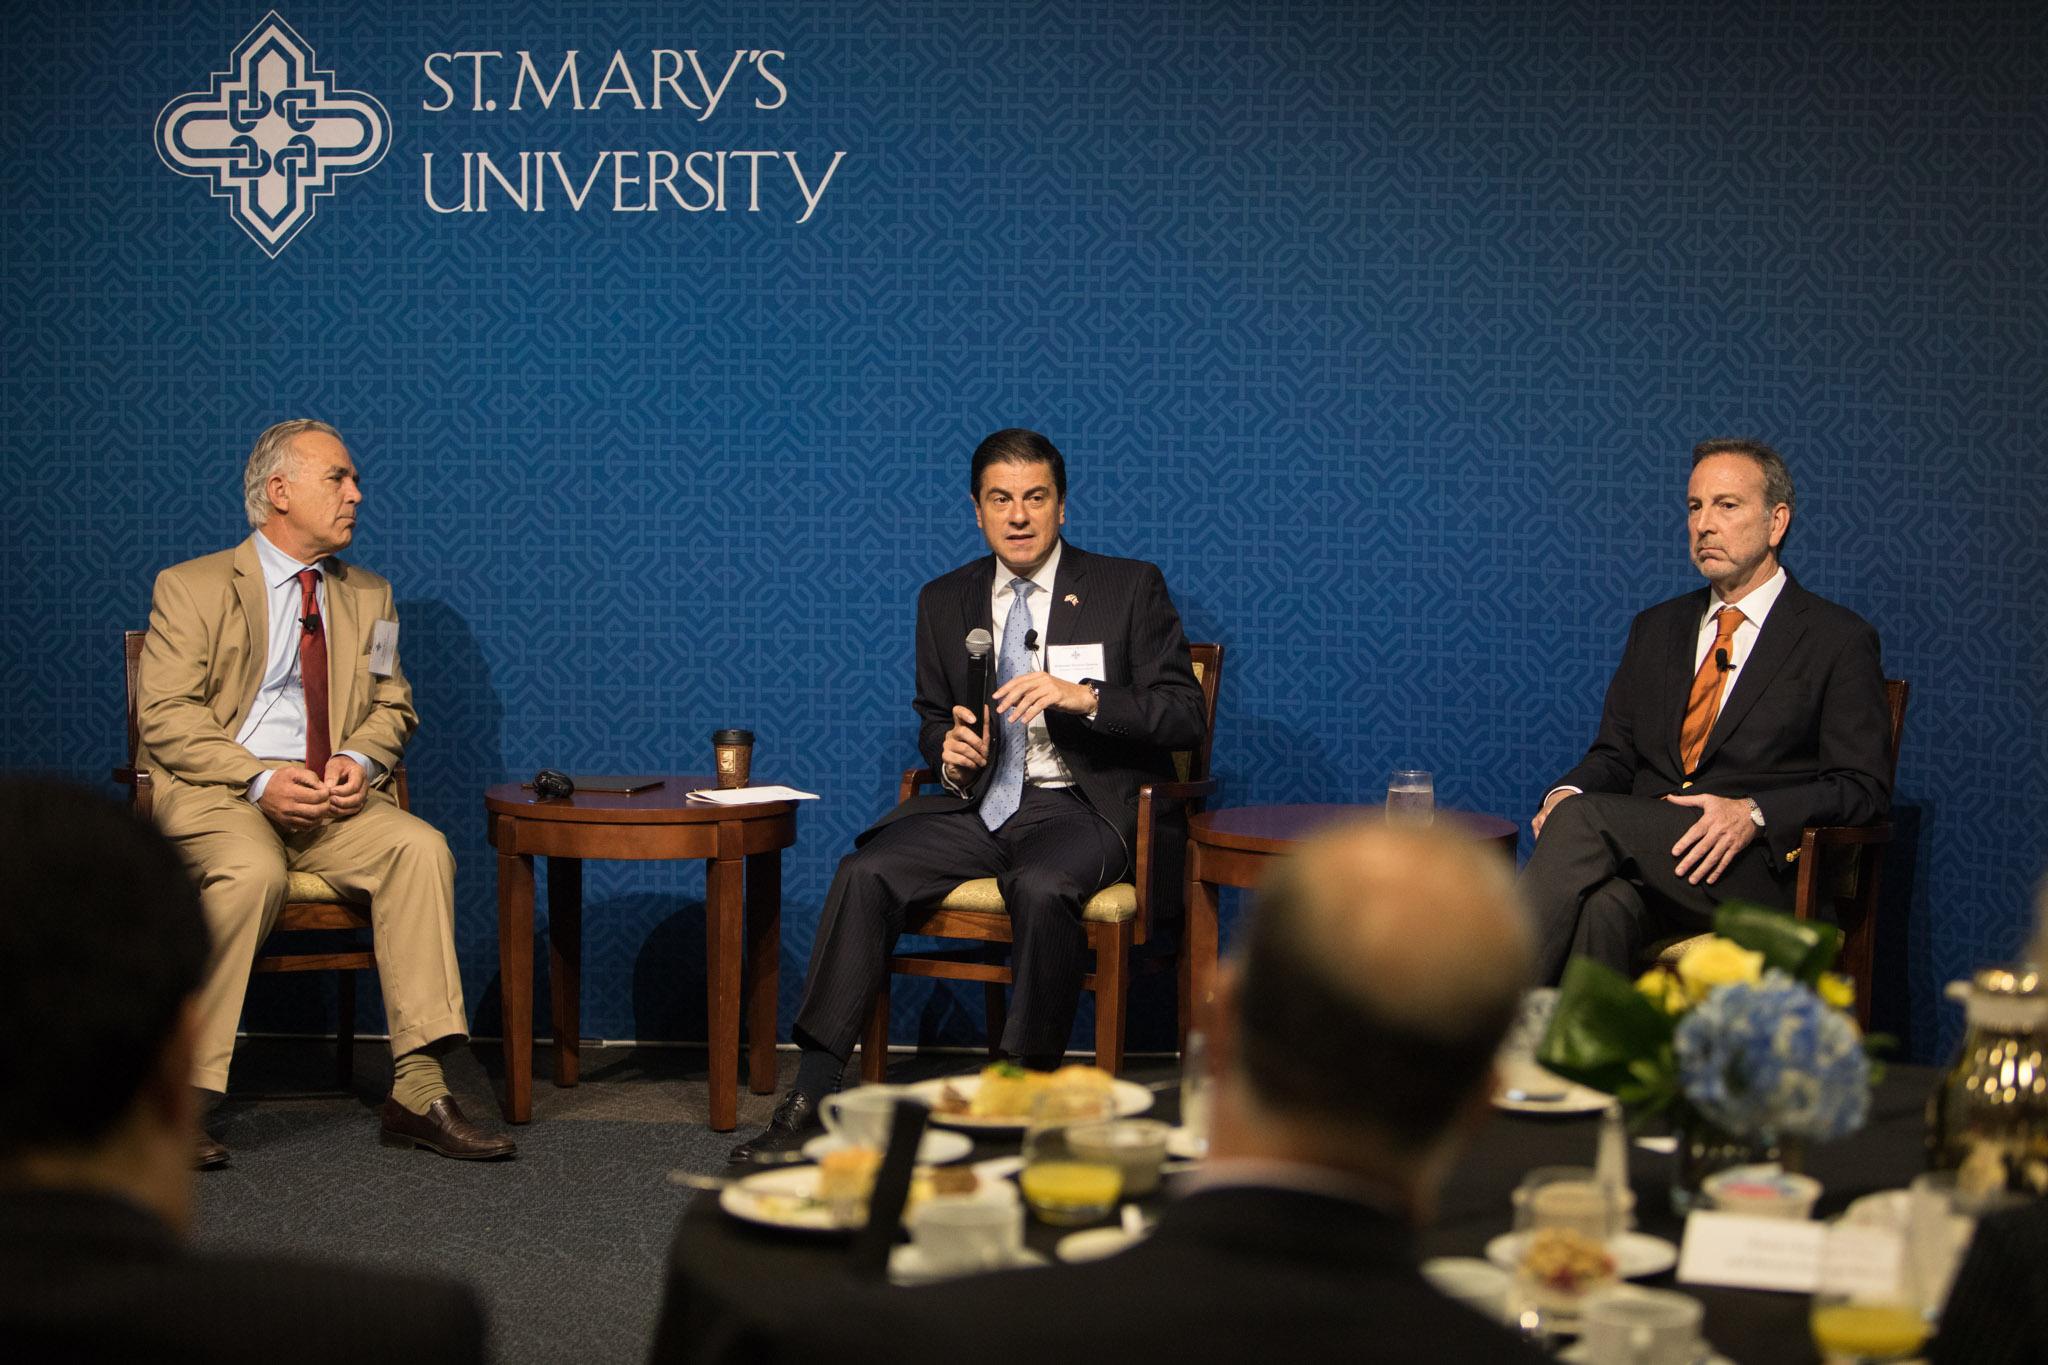 (From left) Rivard Report Director Robert Rivard moderates a panel featuring Ambassador of Mexico to U.S. Gerónimo Gutiérrez and Former U.S. Ambassador to Mexico Tony Garza at NAFTA 2.0: The Future of North American Trade at St. Mary's University.